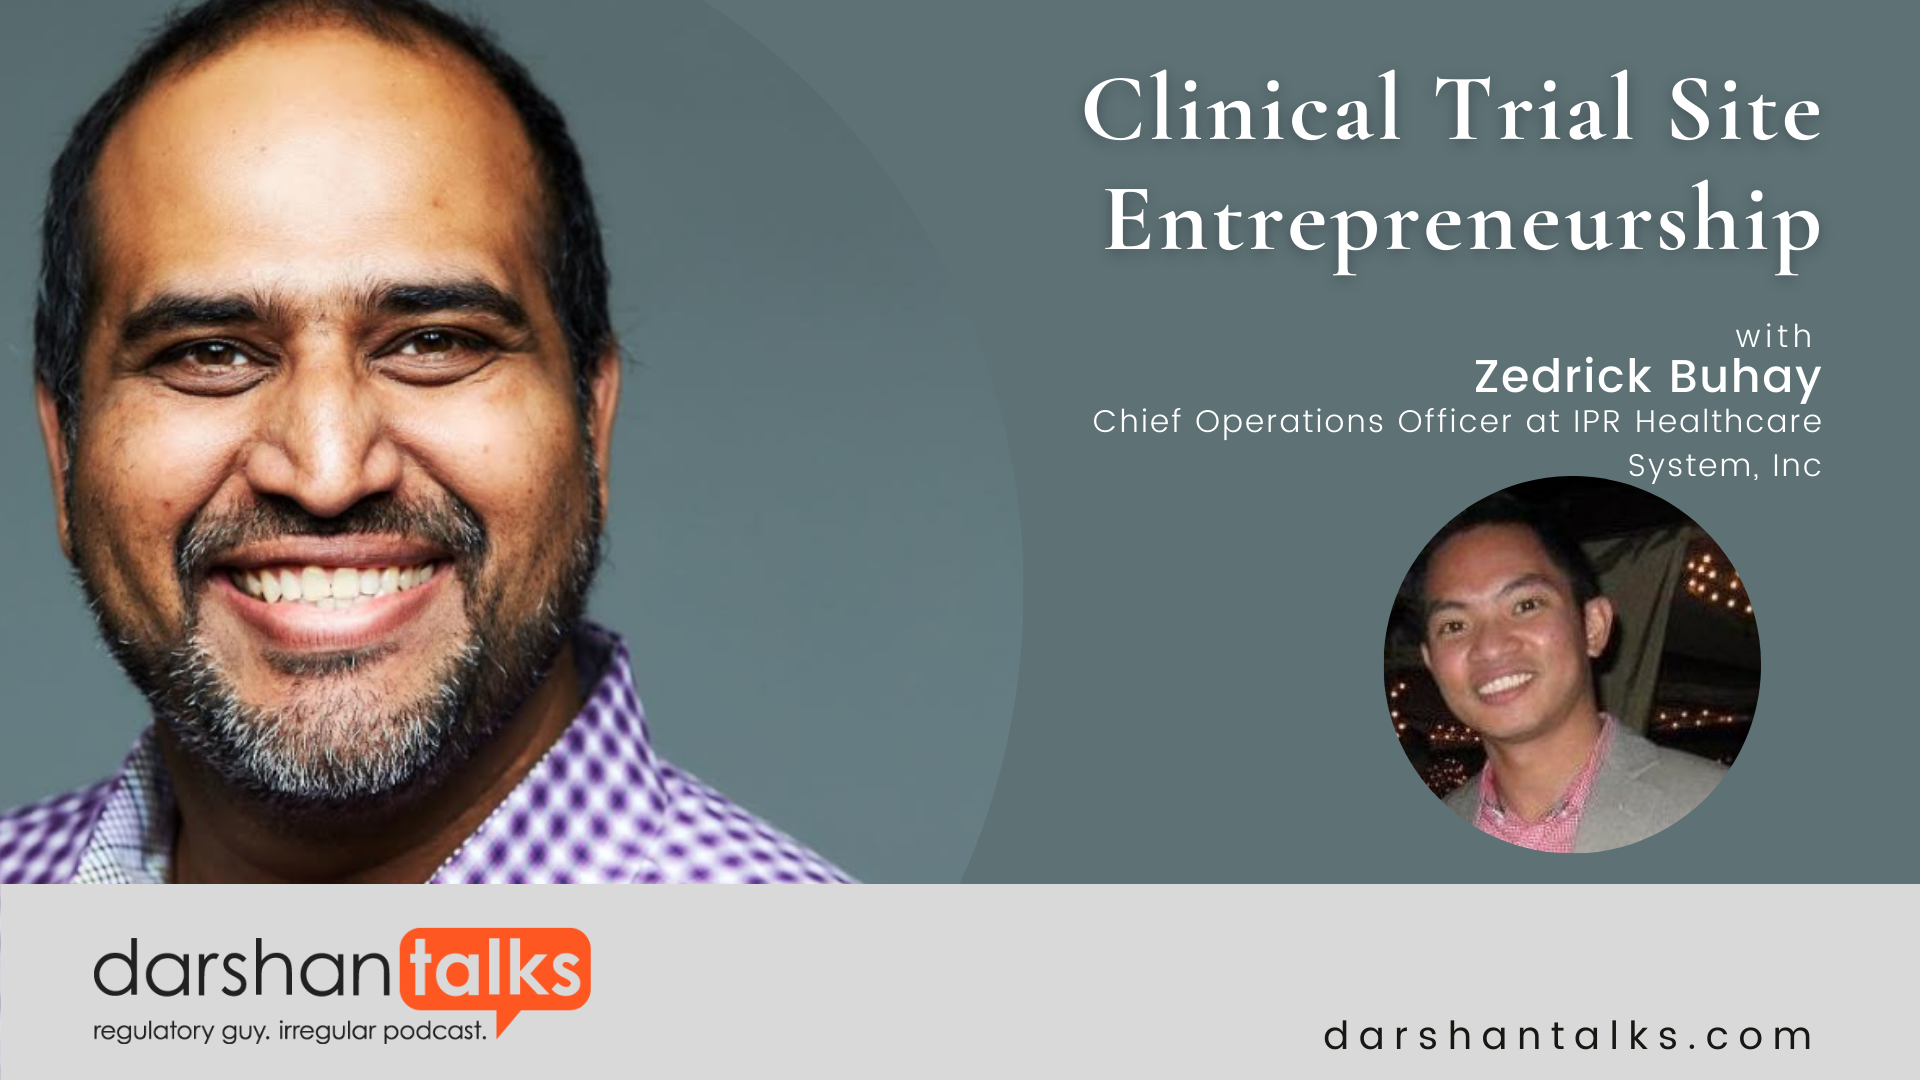 Clinical Trials Site Entrepreneurship